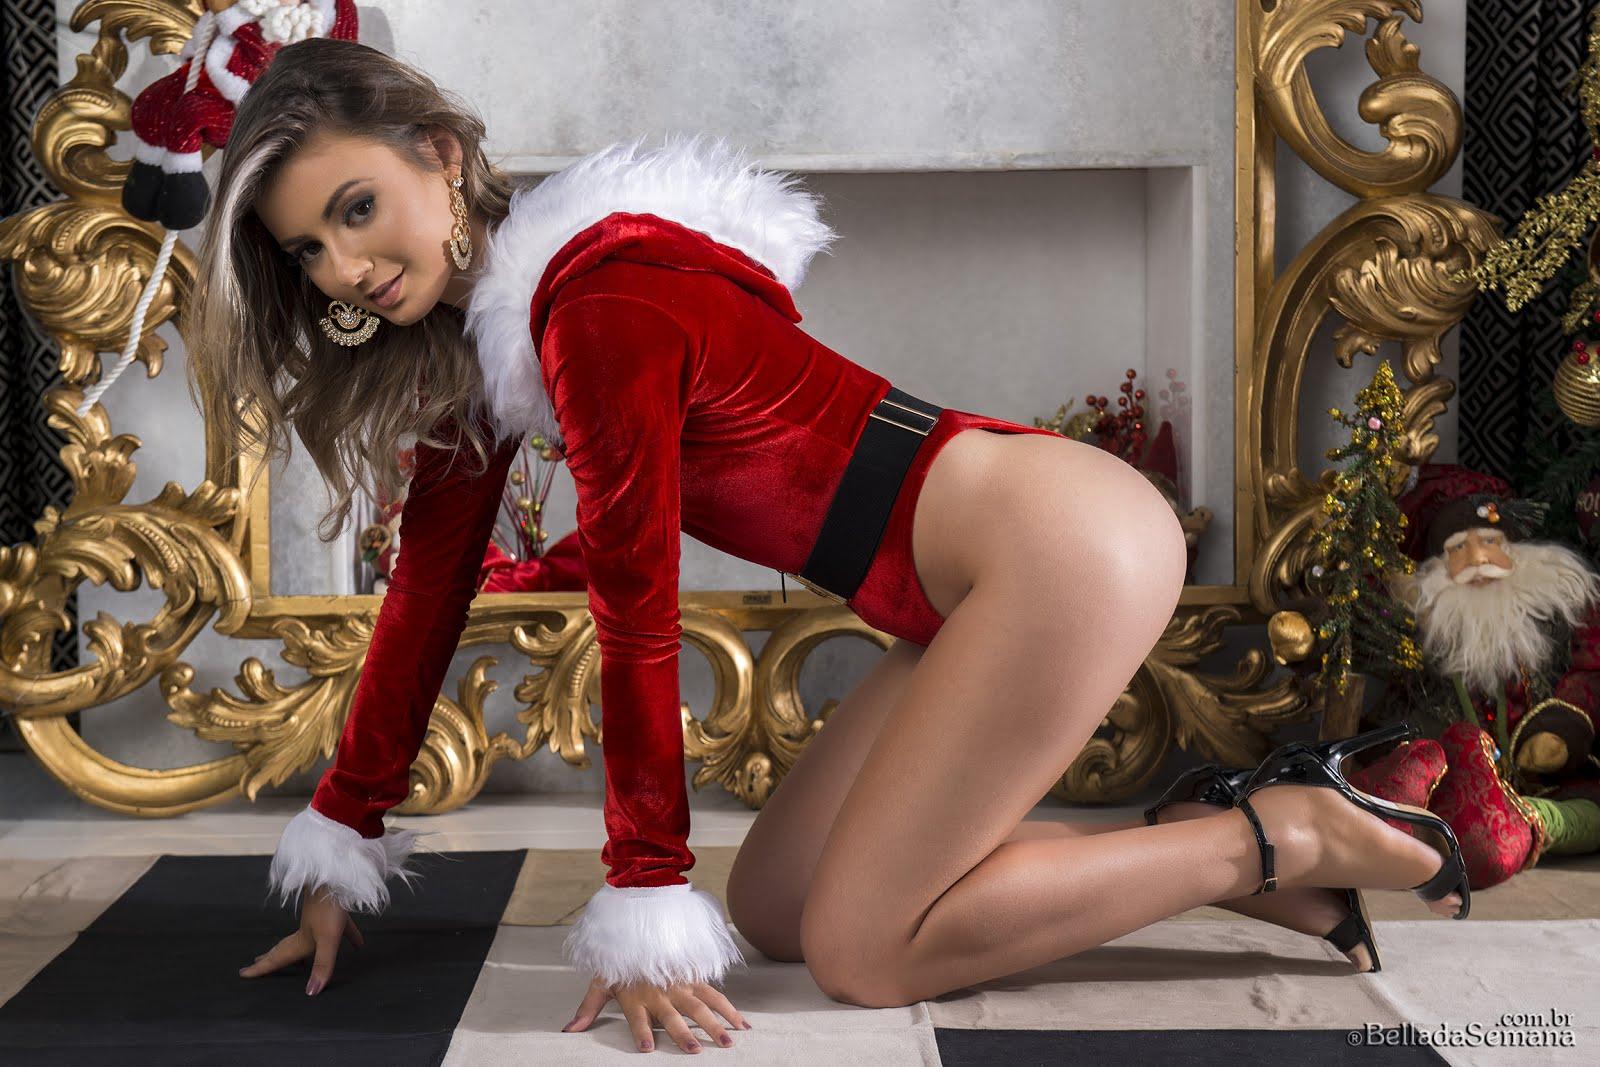 Bella da Semana lança ensaio especial de Natal